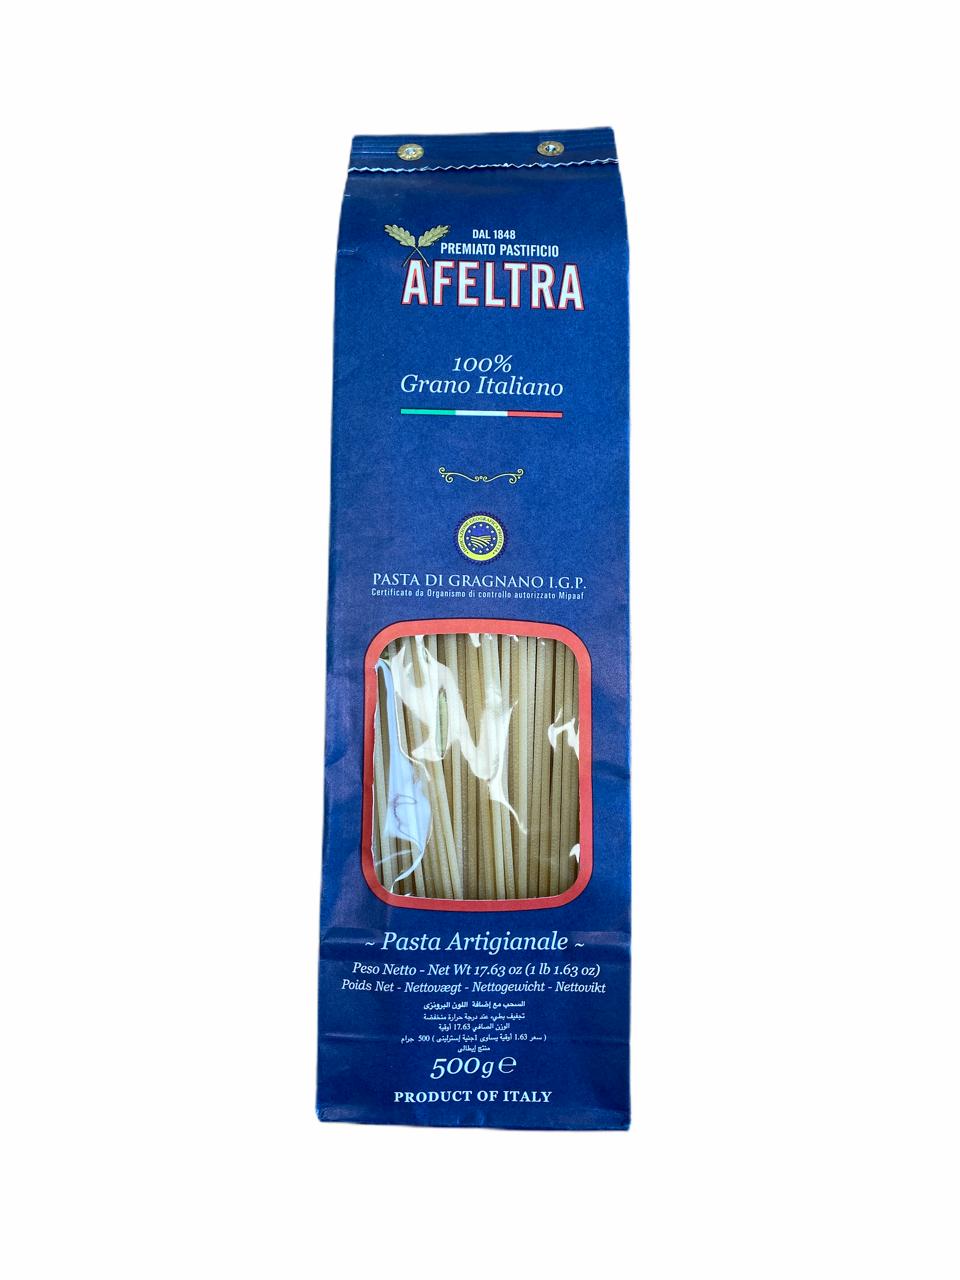 Bucatino di gragnano, Afeltra (500 g)